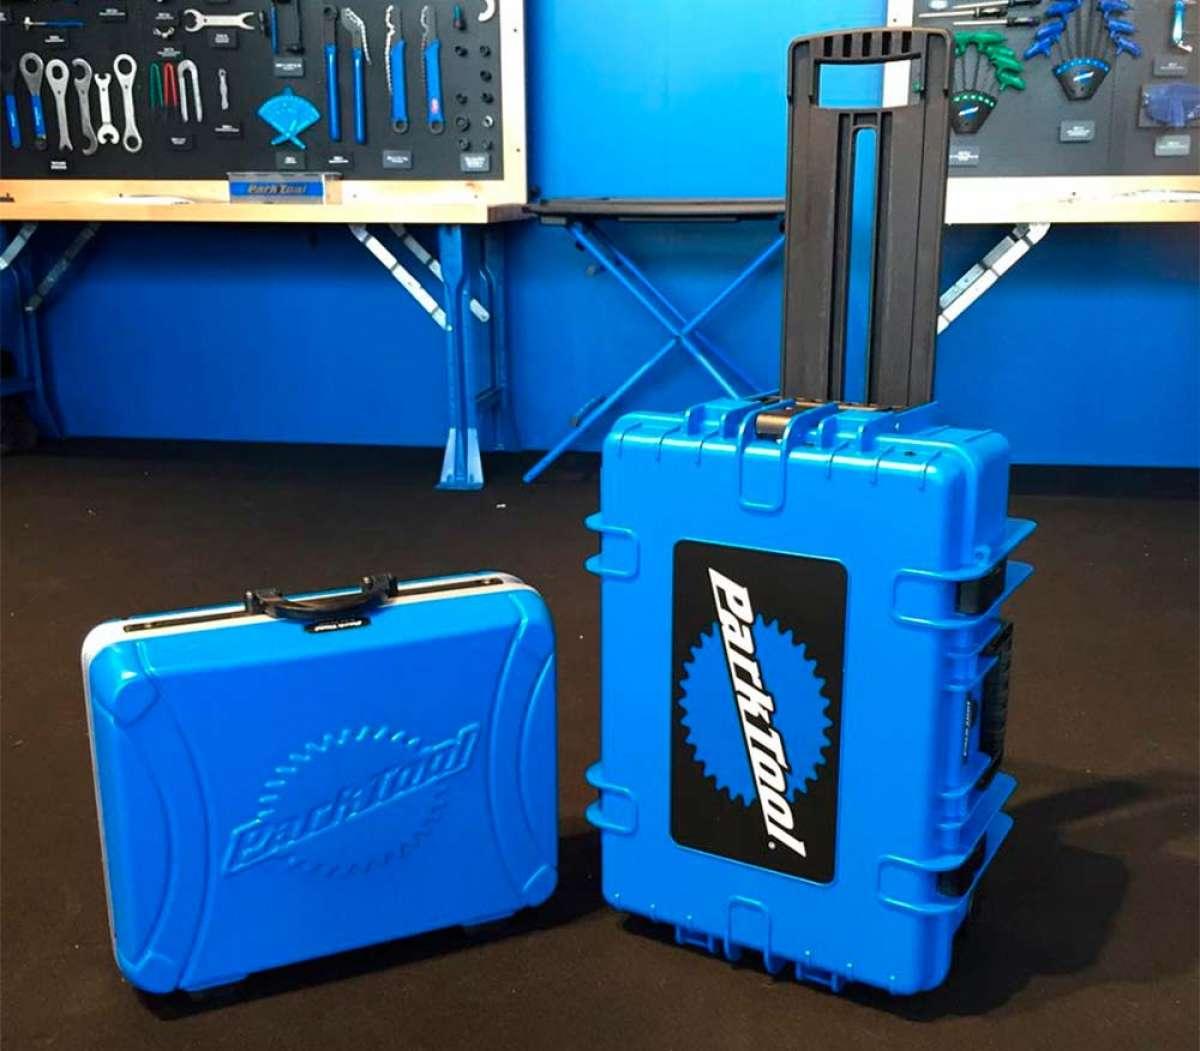 Park Tool presenta dos maletas de herramientas para mecánicos viajeros